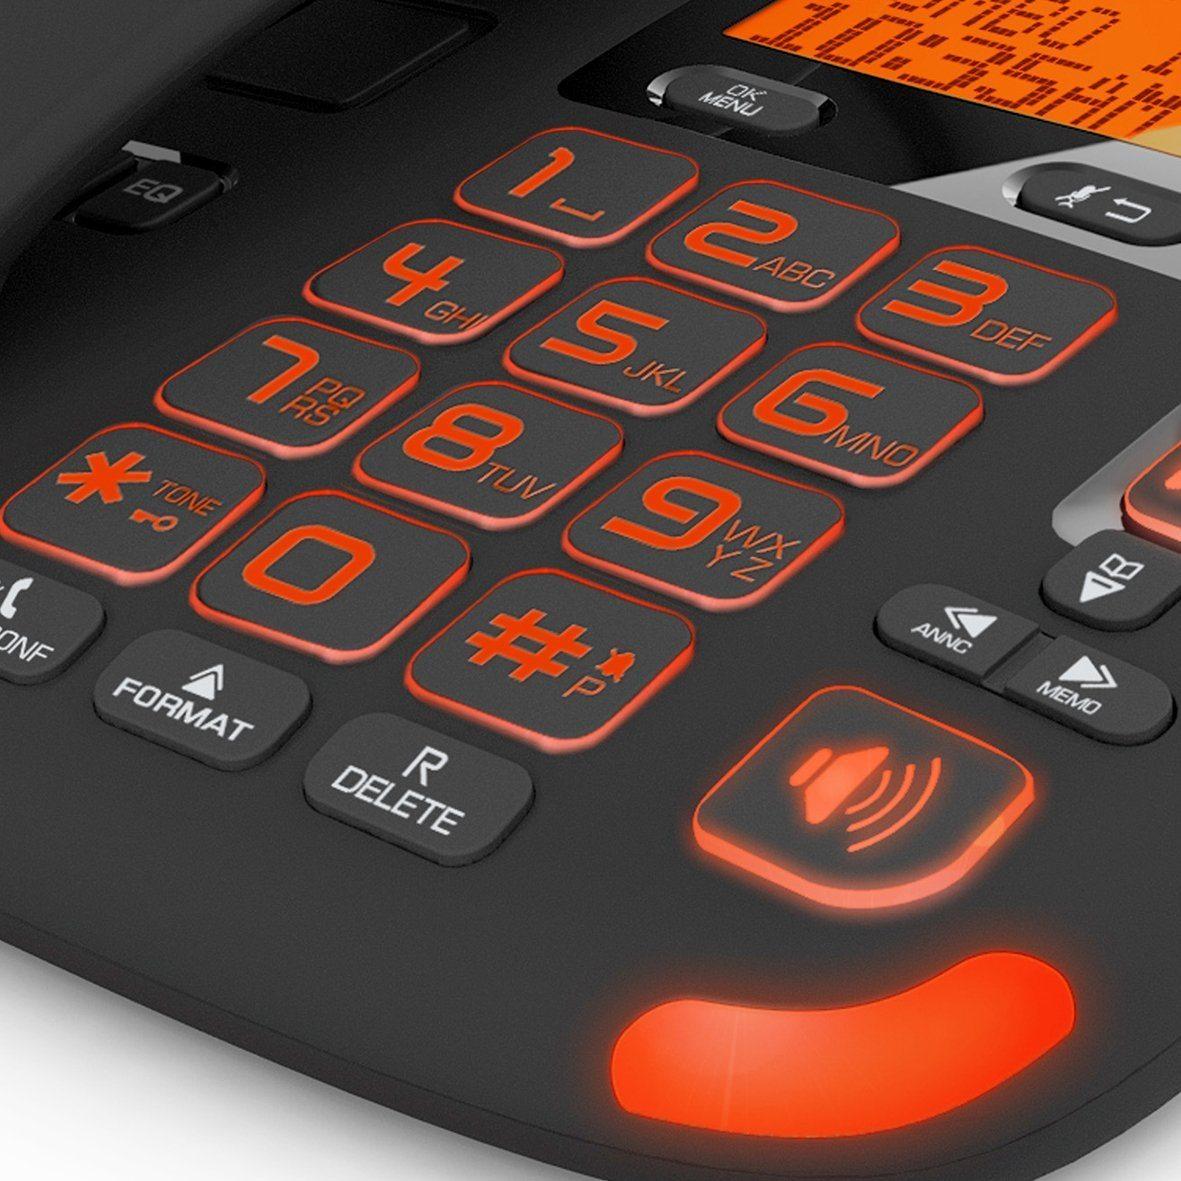 Switel DCT50072 VITA DECT Seniorentelefon4